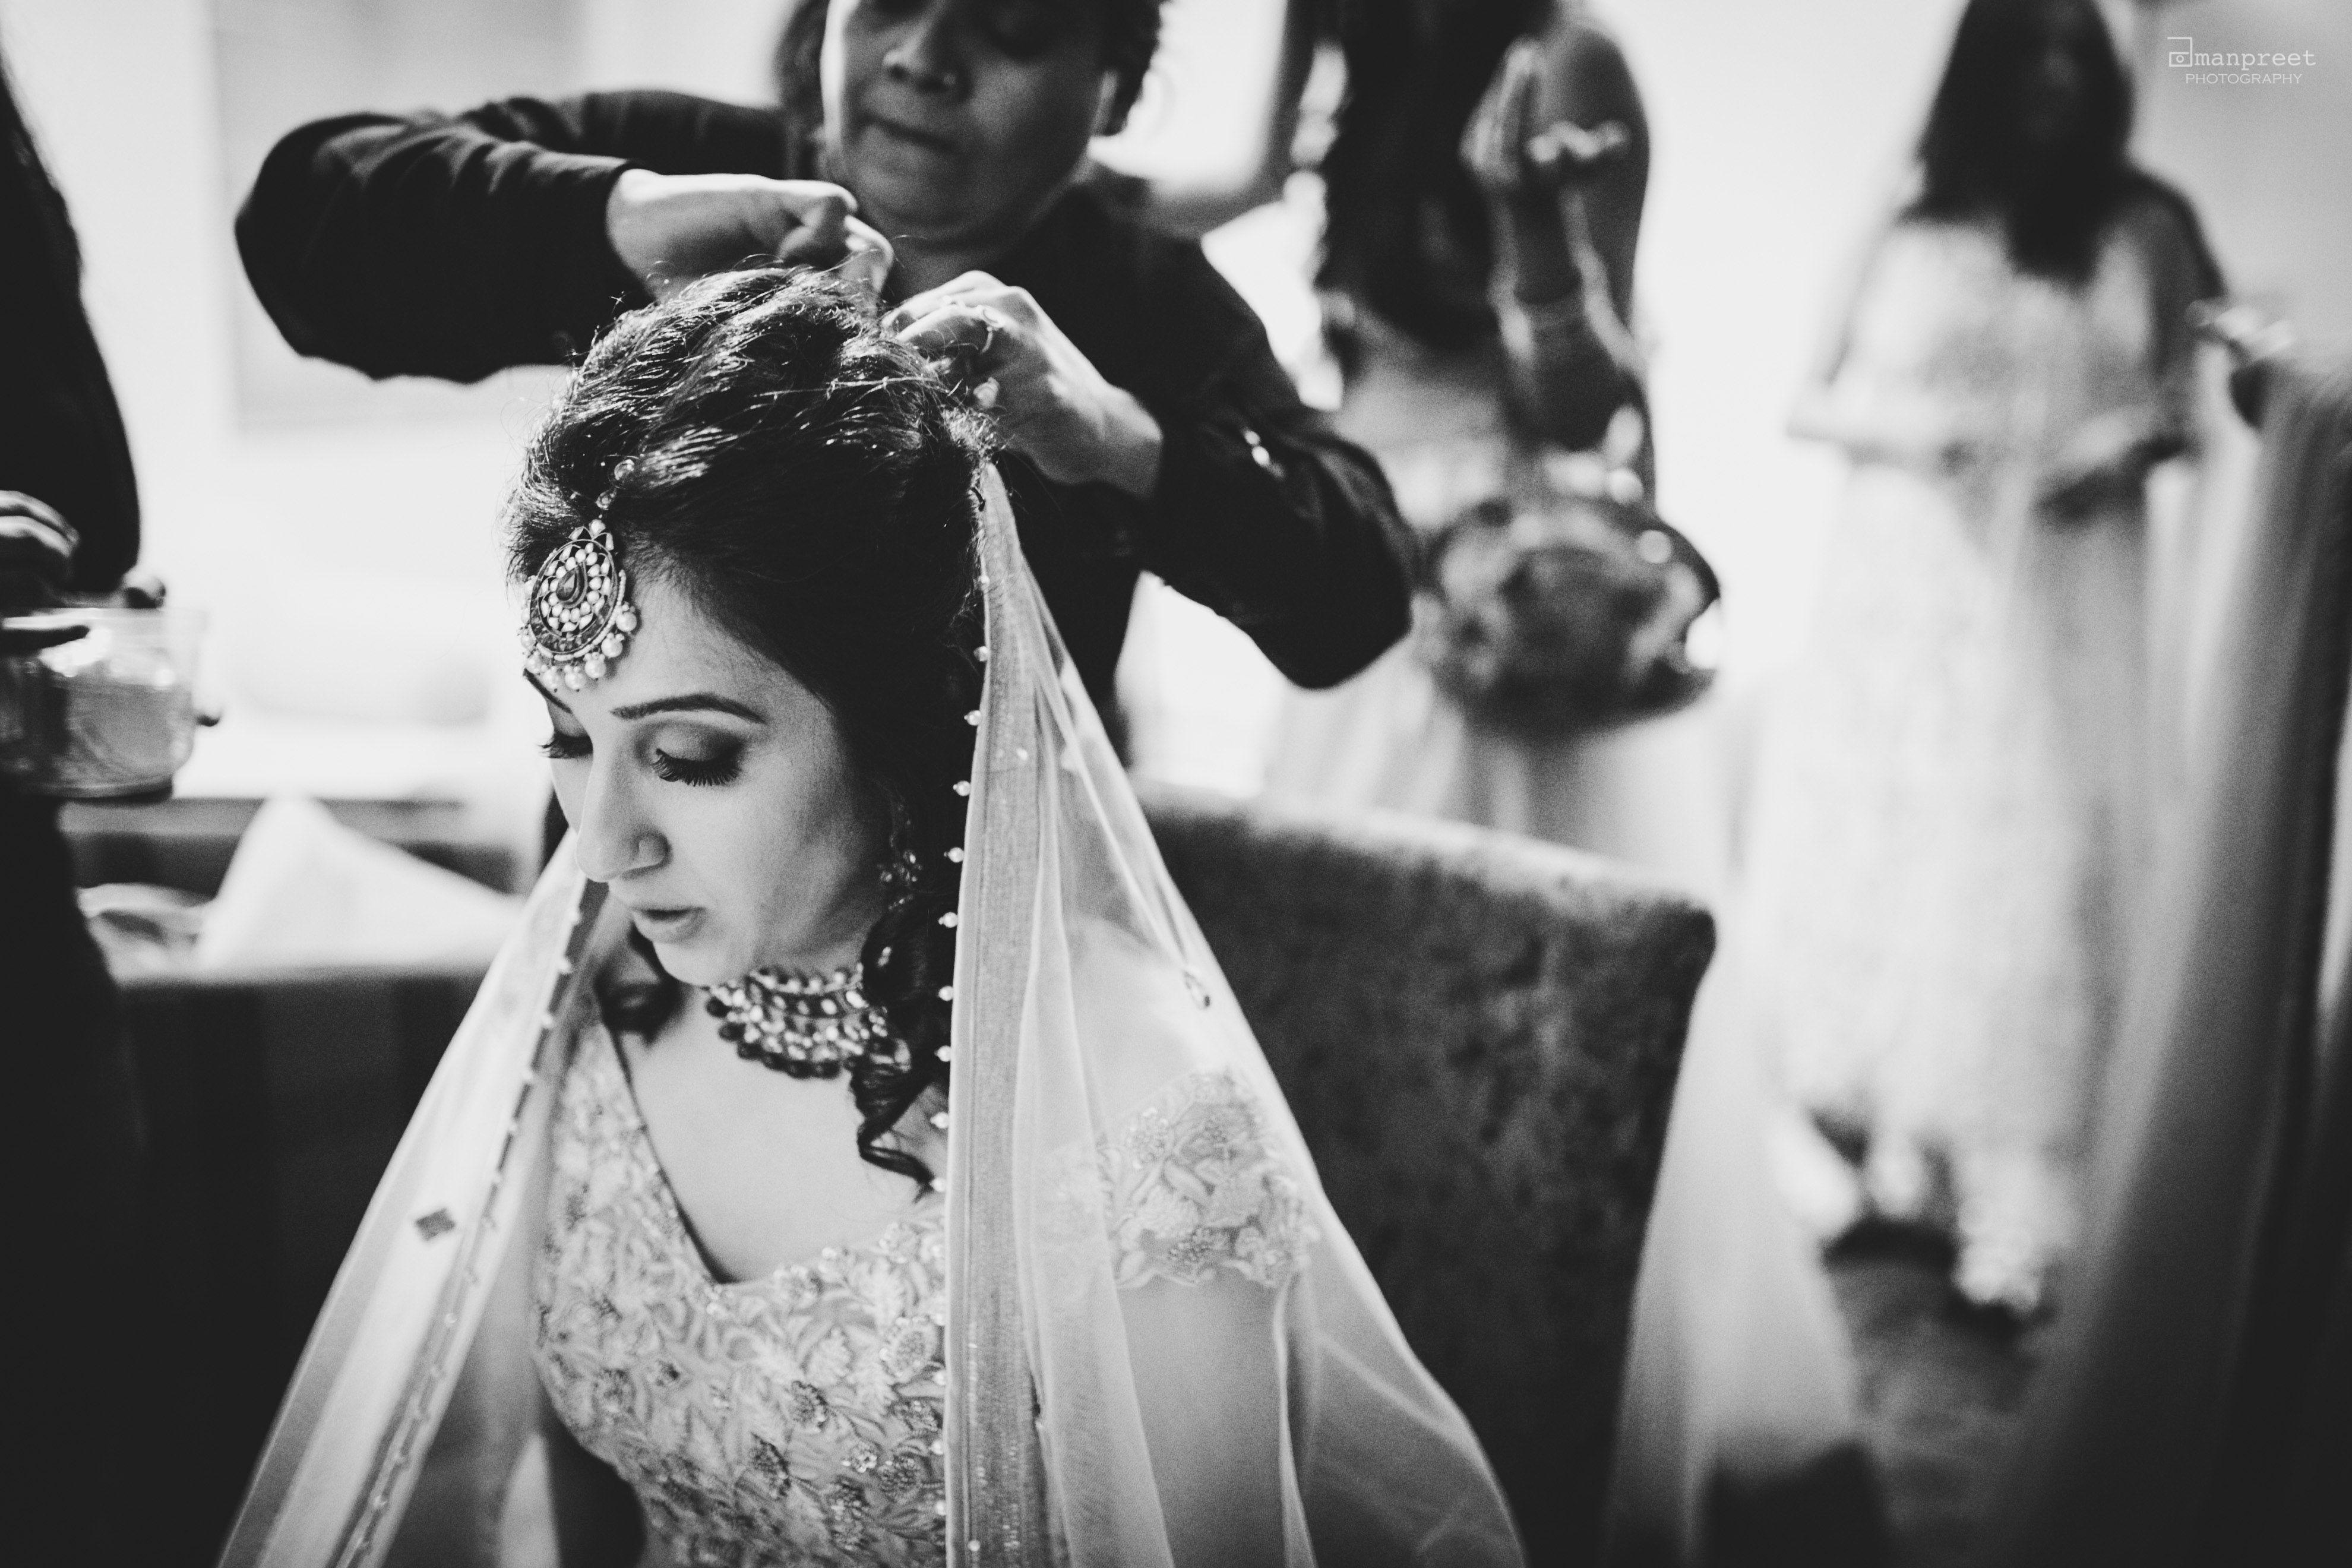 the bride kriti!:geetanjali salon, raju mehandi wala, amanpreet photography, ole couture